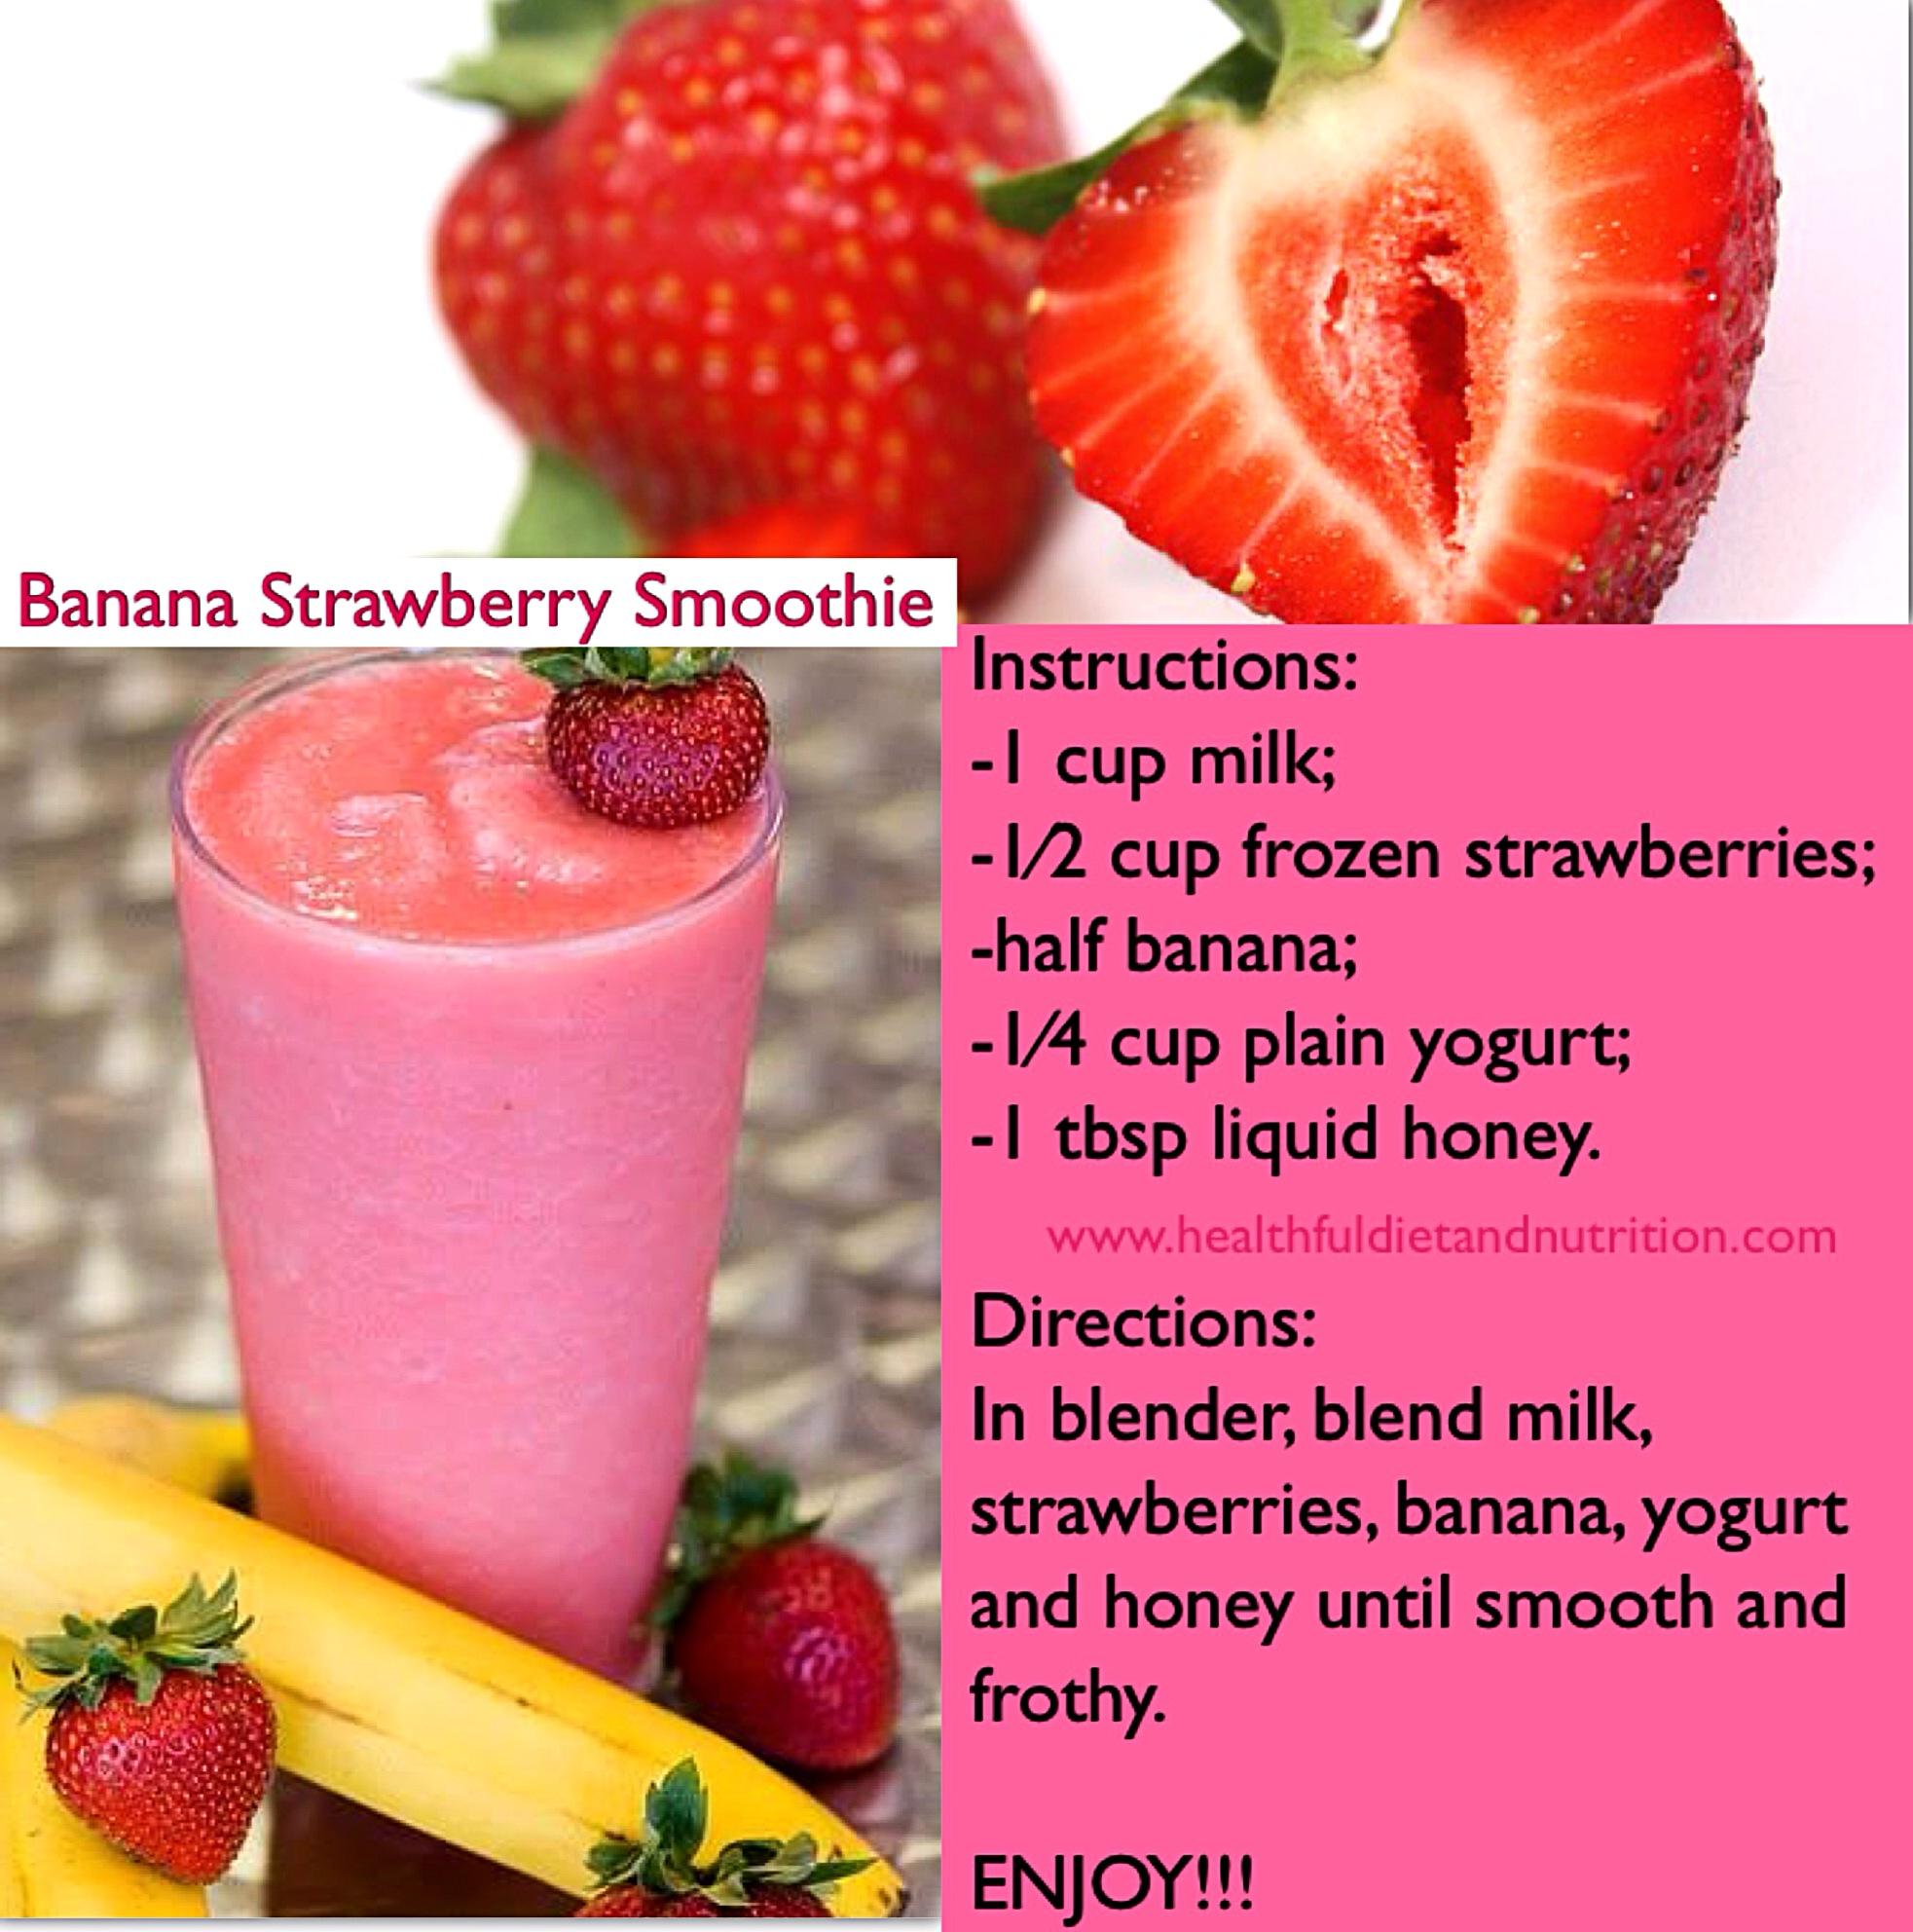 Banana, Strawberry Smoothie